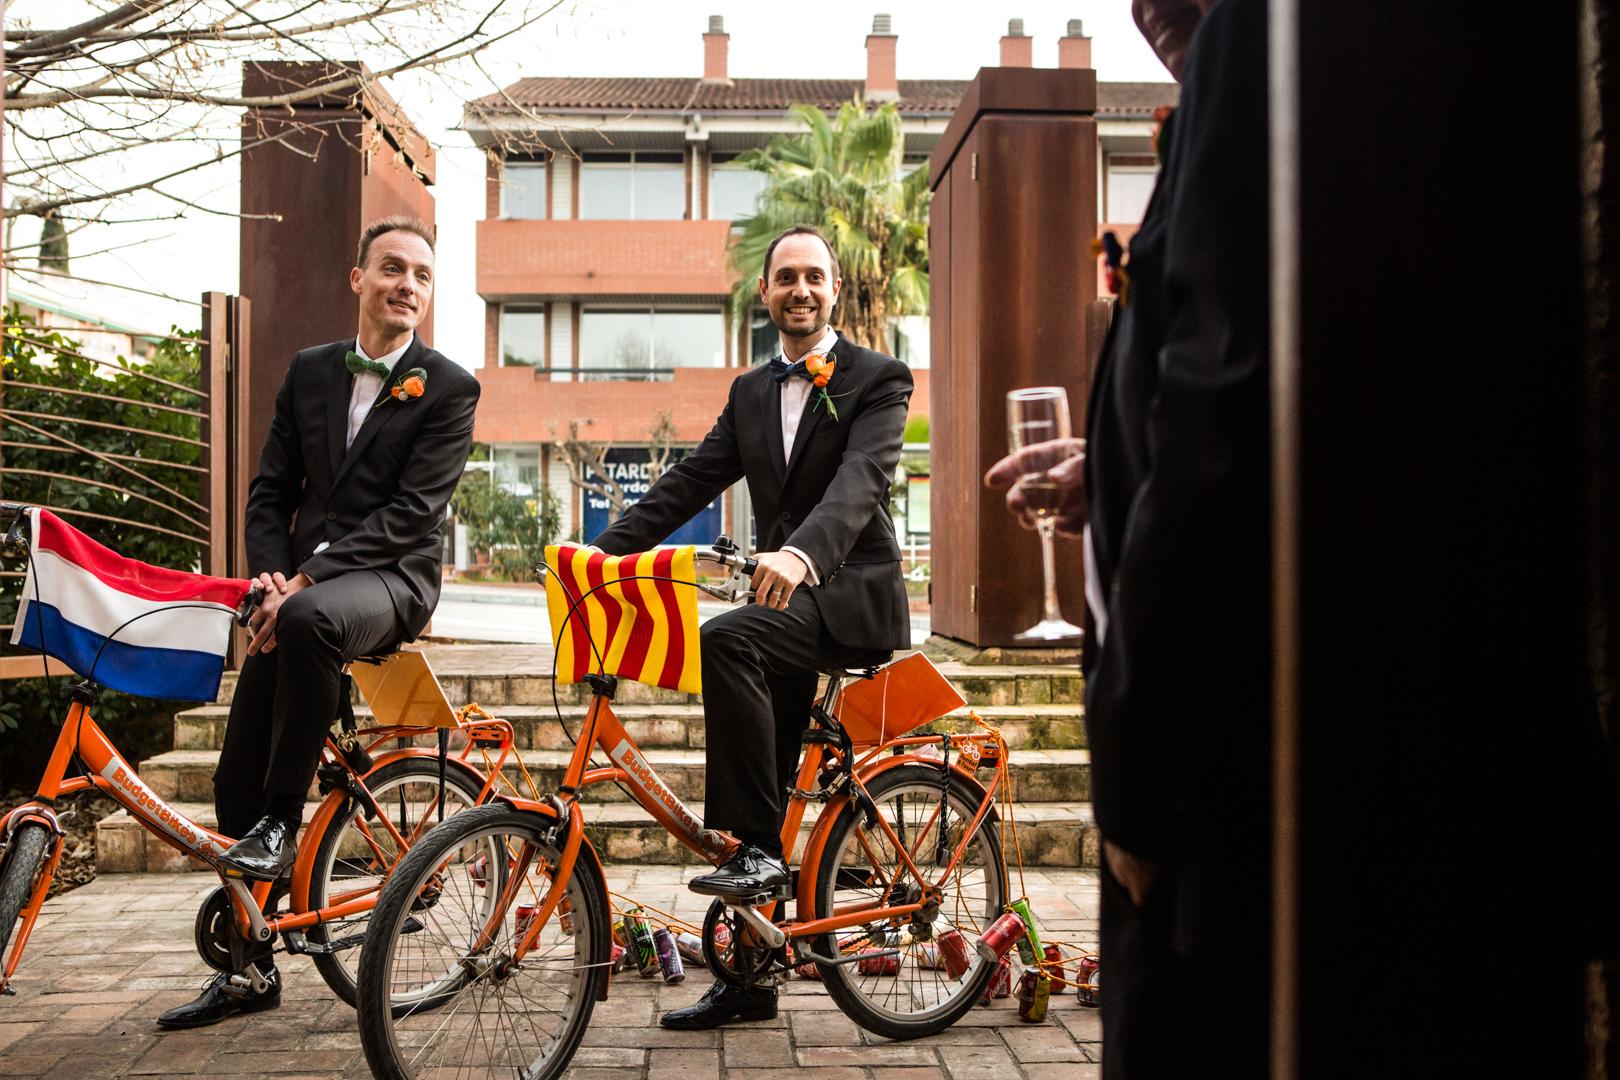 Same-sex-wedding-barcelona-boda- gay-samesex-engagement-Rafael-Torres-fotografo-bodas-sevilla-madrid-barcelona-wedding-photographer--35.jpg